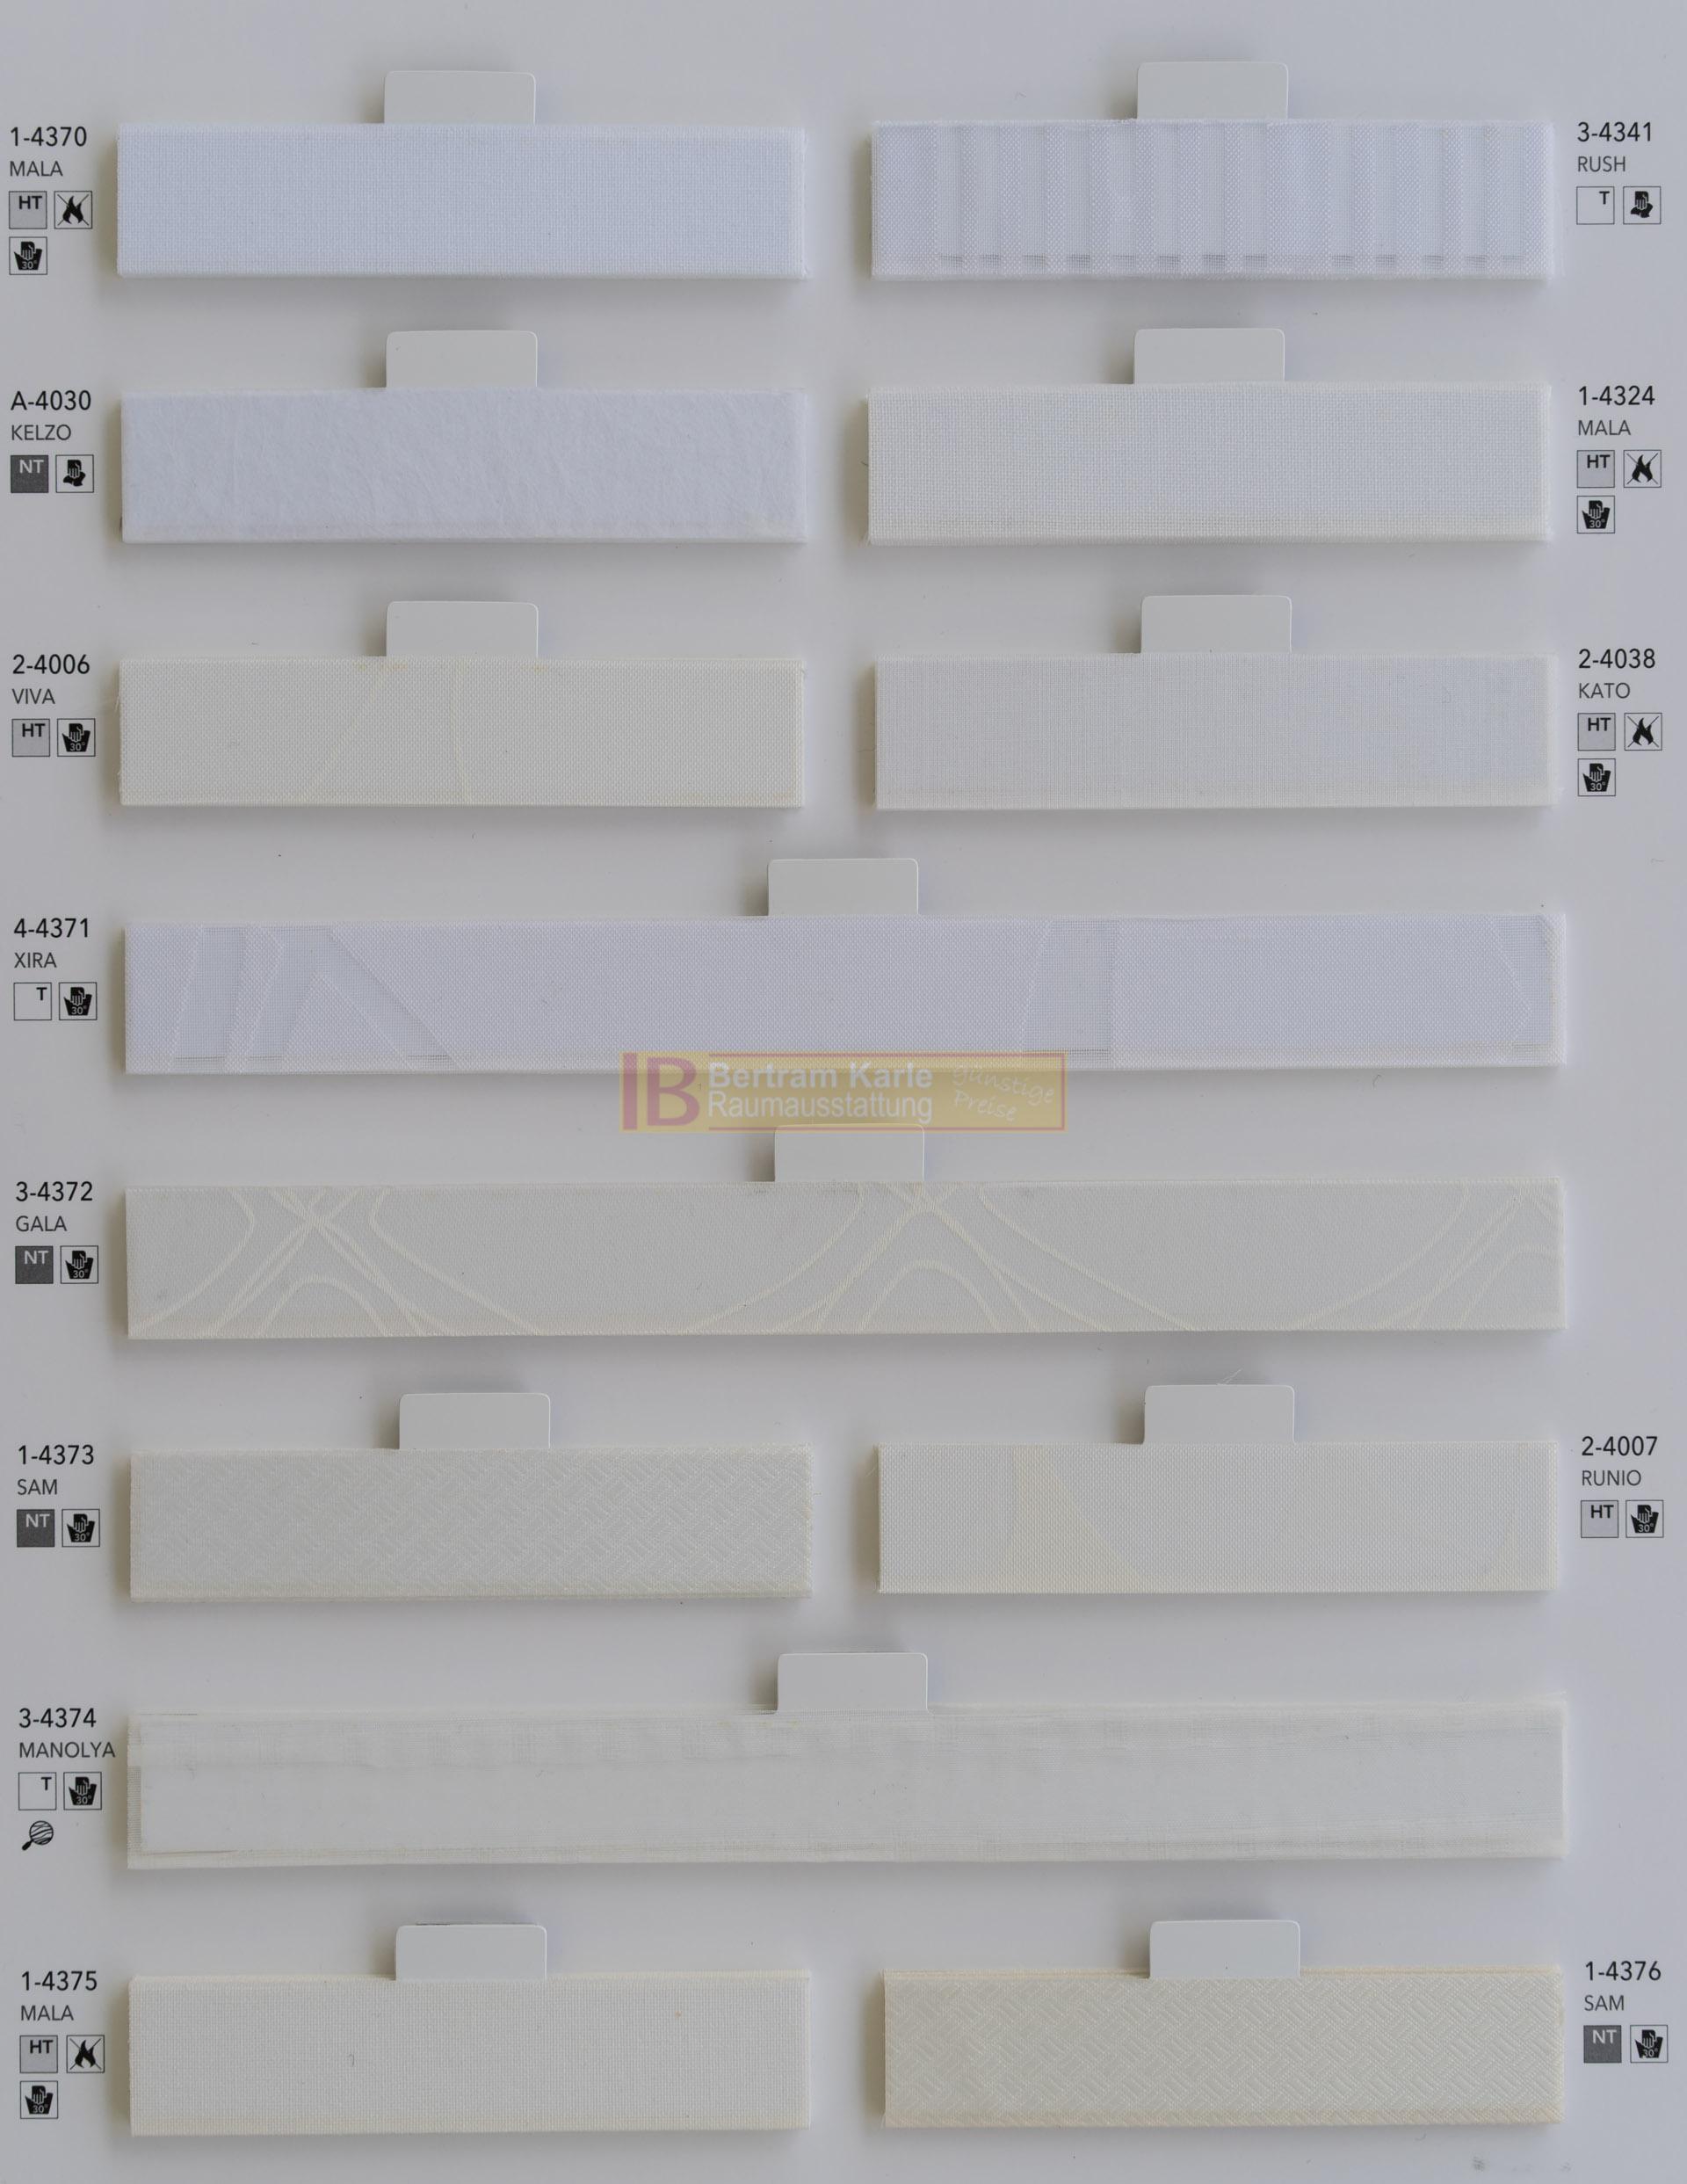 mhz vorhnge gallery of mit fensterclip with mhz vorhnge mhz hafttextil squid with mhz vorhnge. Black Bedroom Furniture Sets. Home Design Ideas